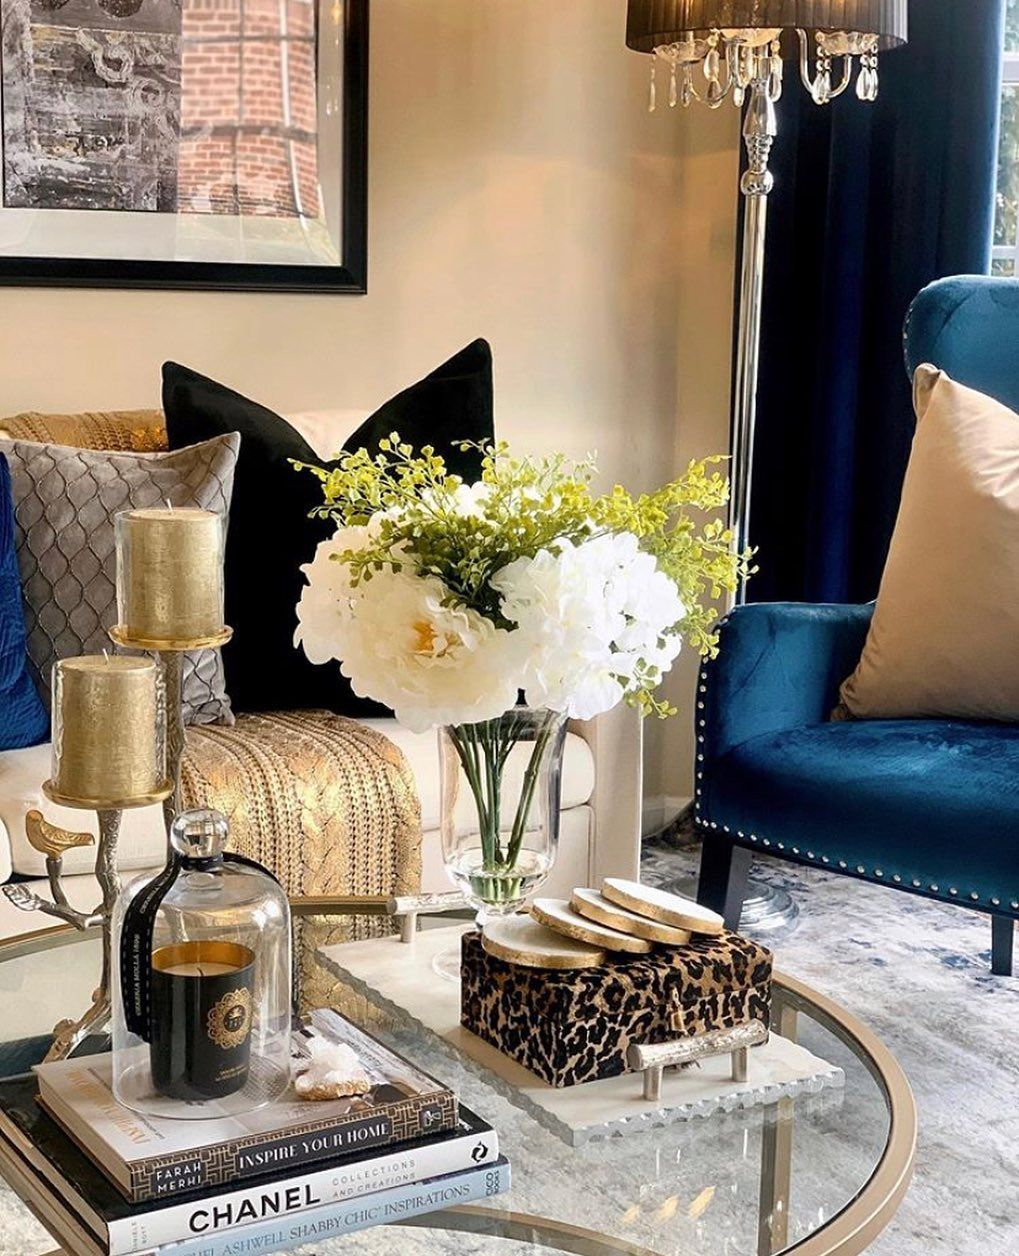 Inspire Me Home Decor On Instagram Farahjmerhi S Book Inspire Your Home Looks Perfect On Noorofmyhome S Bea In 2020 Inspire Me Home Decor Home Decor Decor Design